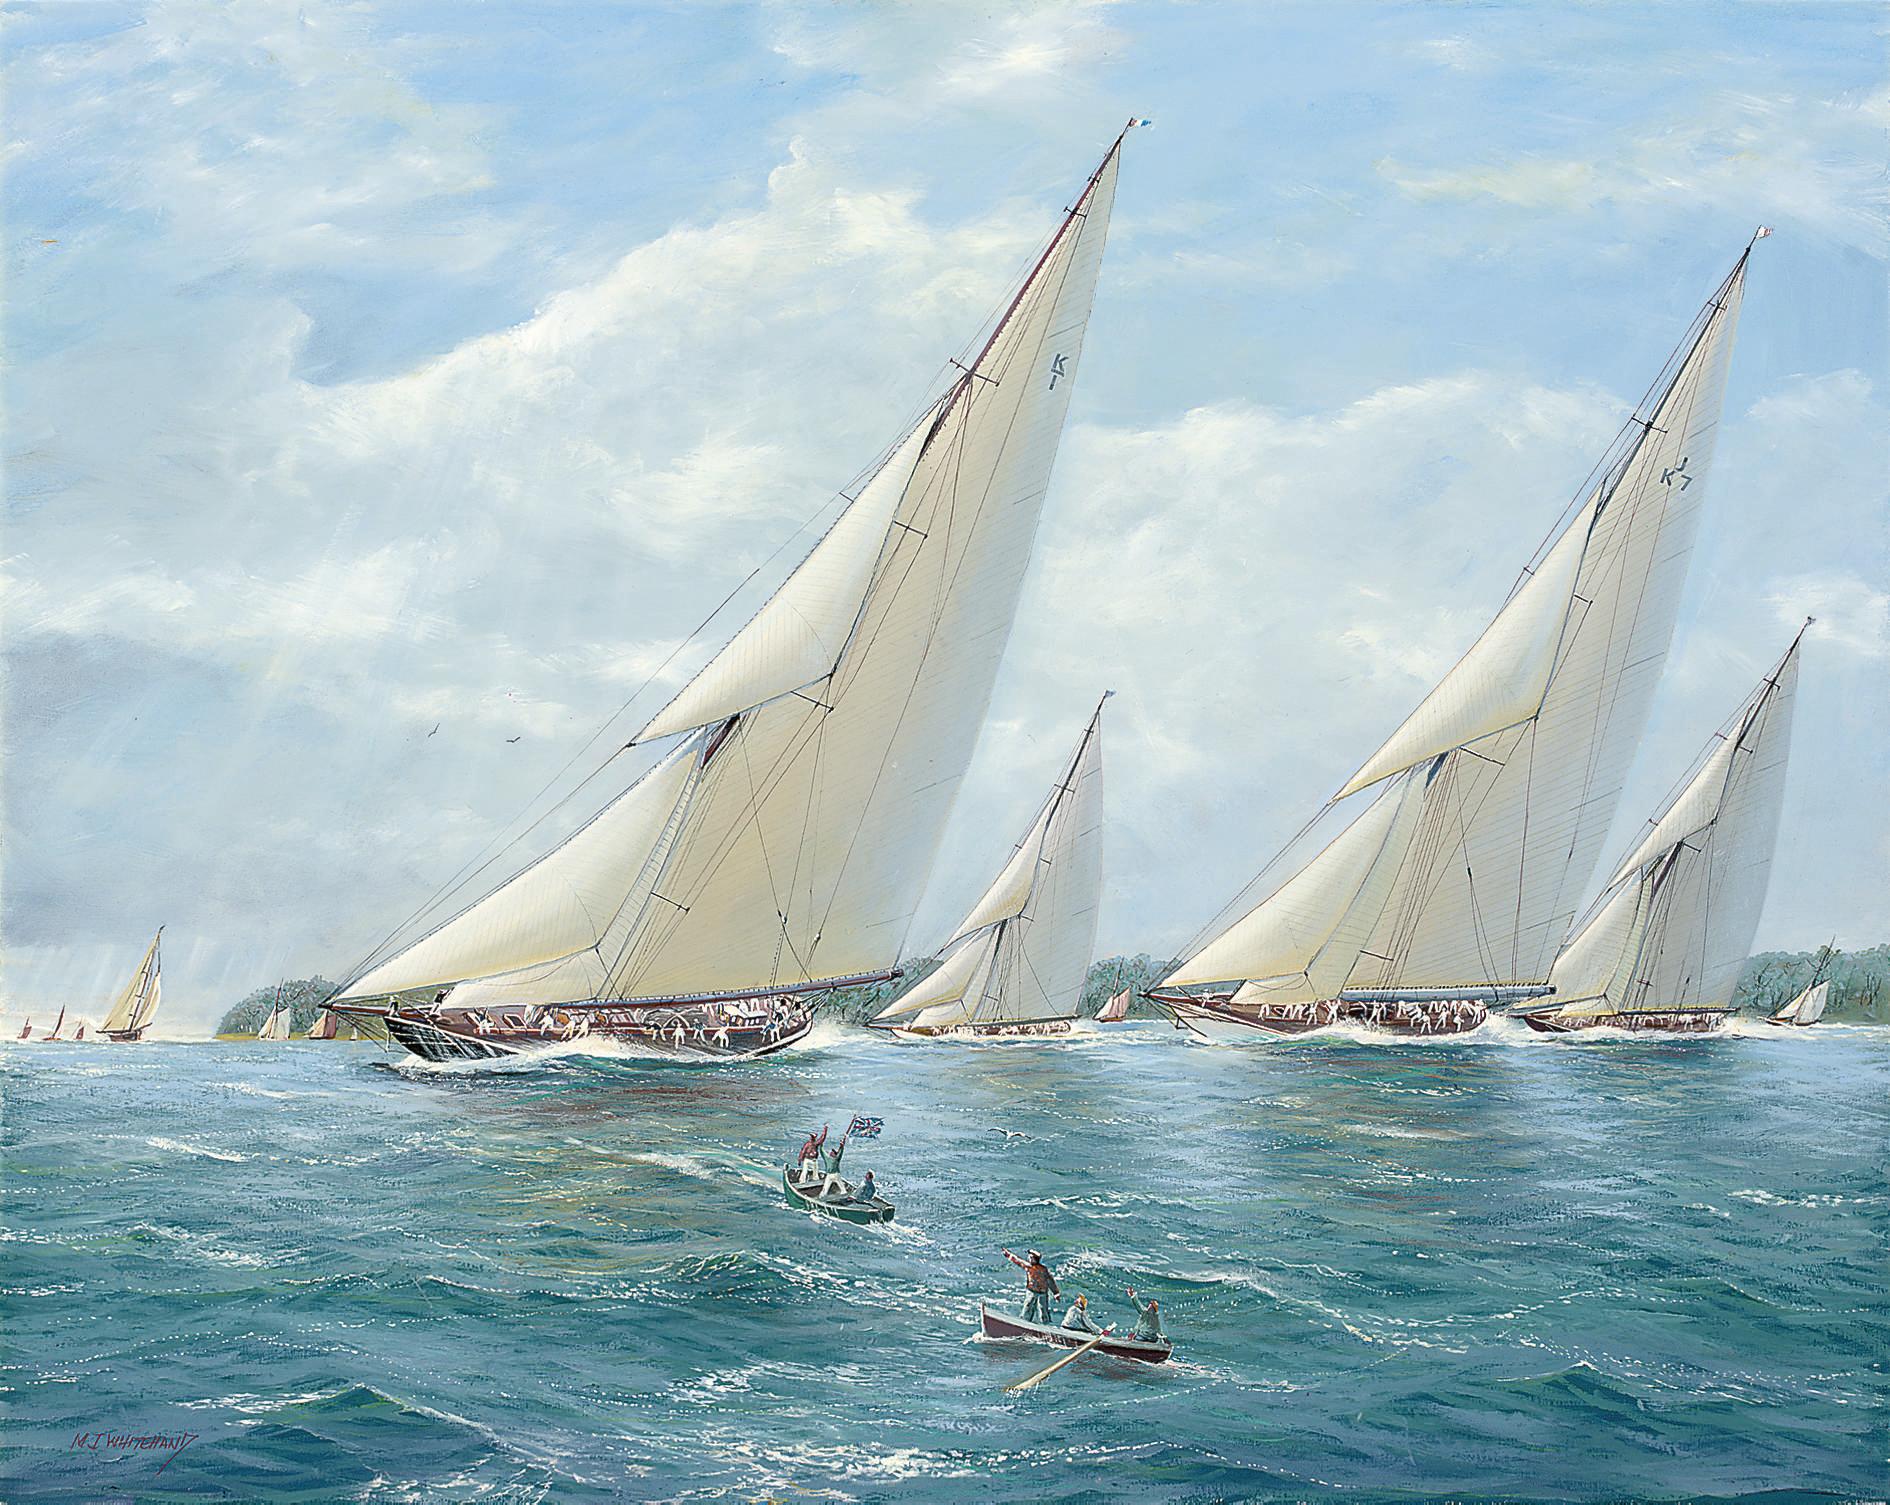 Britannia leading the fleet to windward